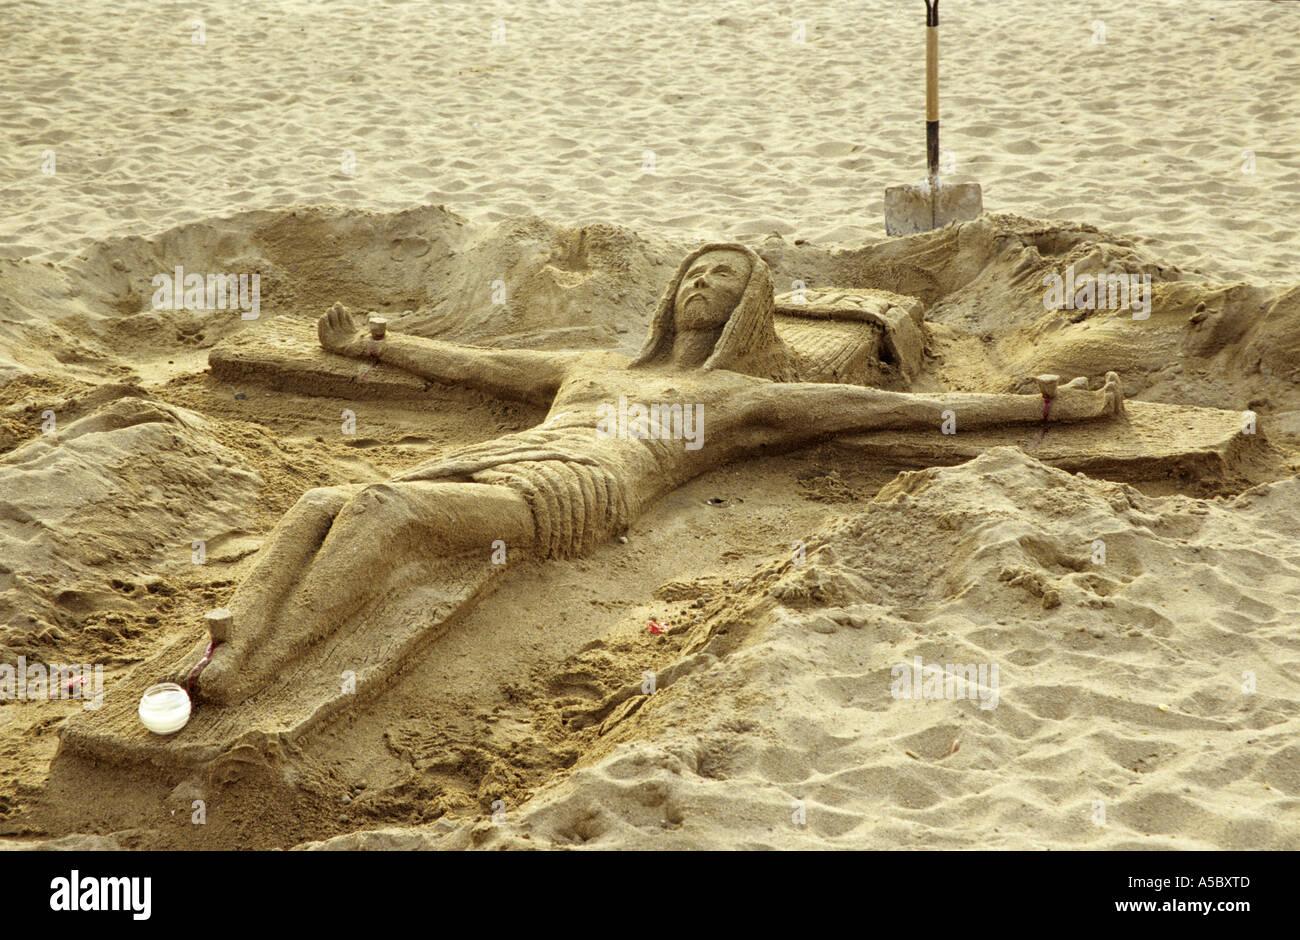 Sand sculpture of Jesus Christ - Stock Image